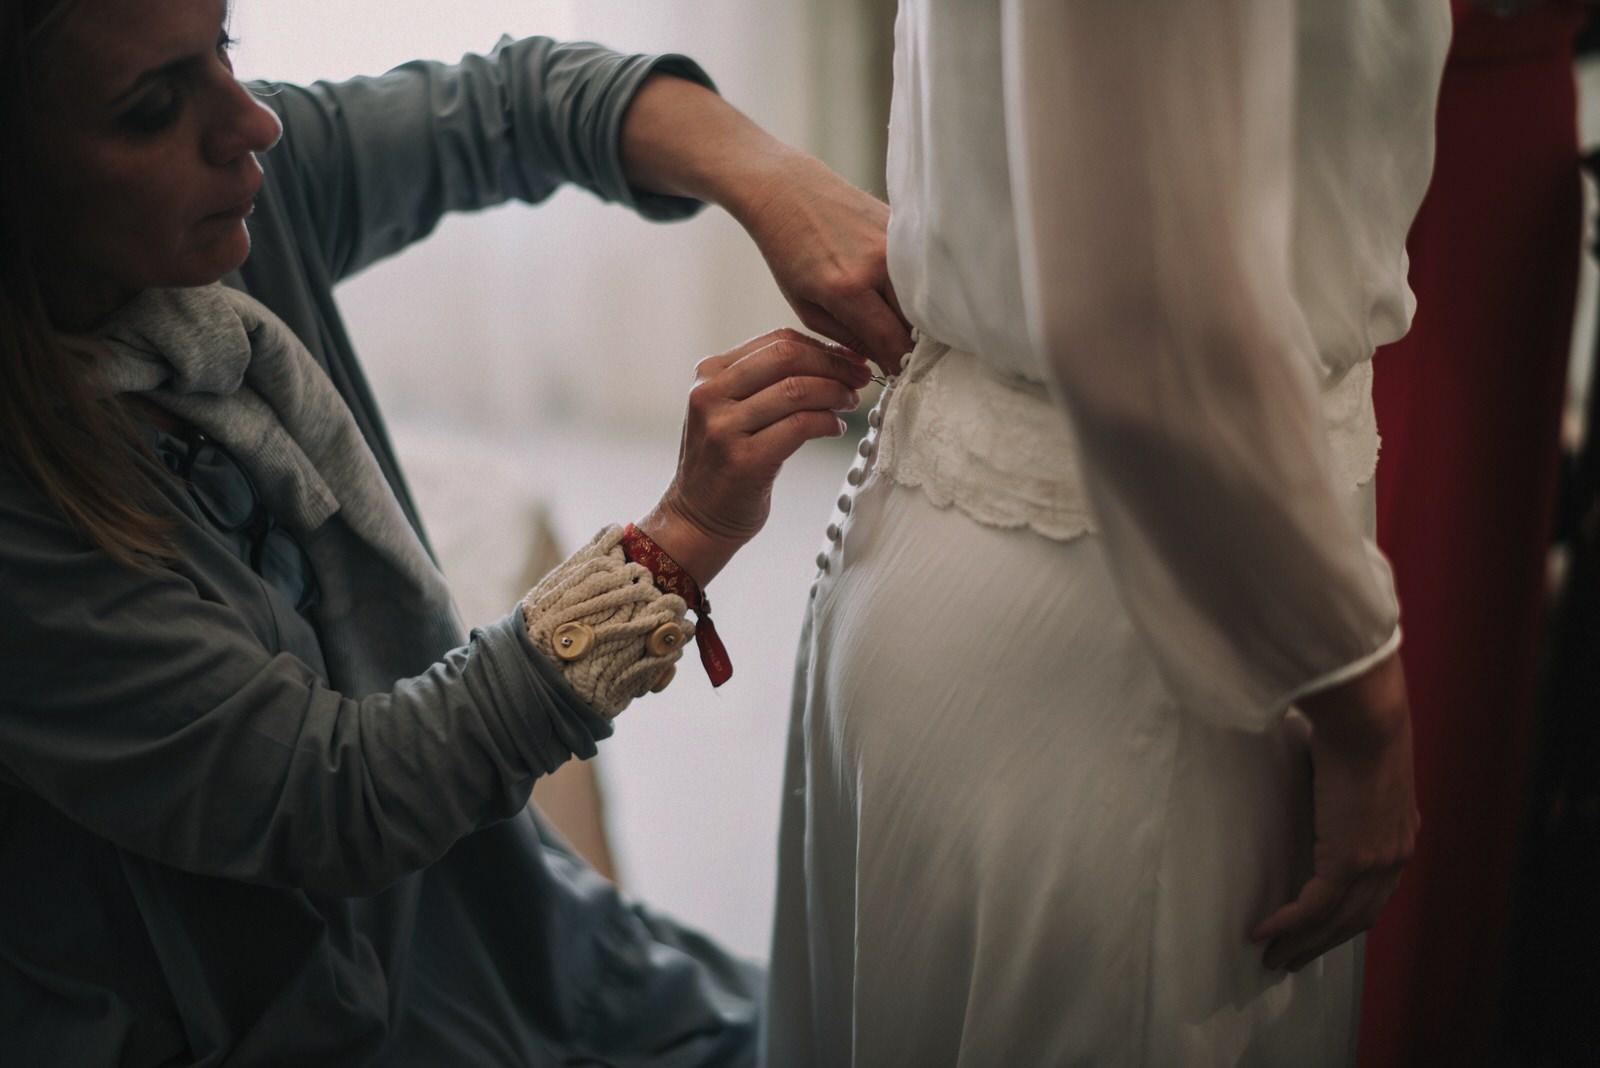 fotografo de bodas sevilla - fotografo boda - fotografía sevilla - Andrés AmarilloAAA_4331- tele- fine.JPG